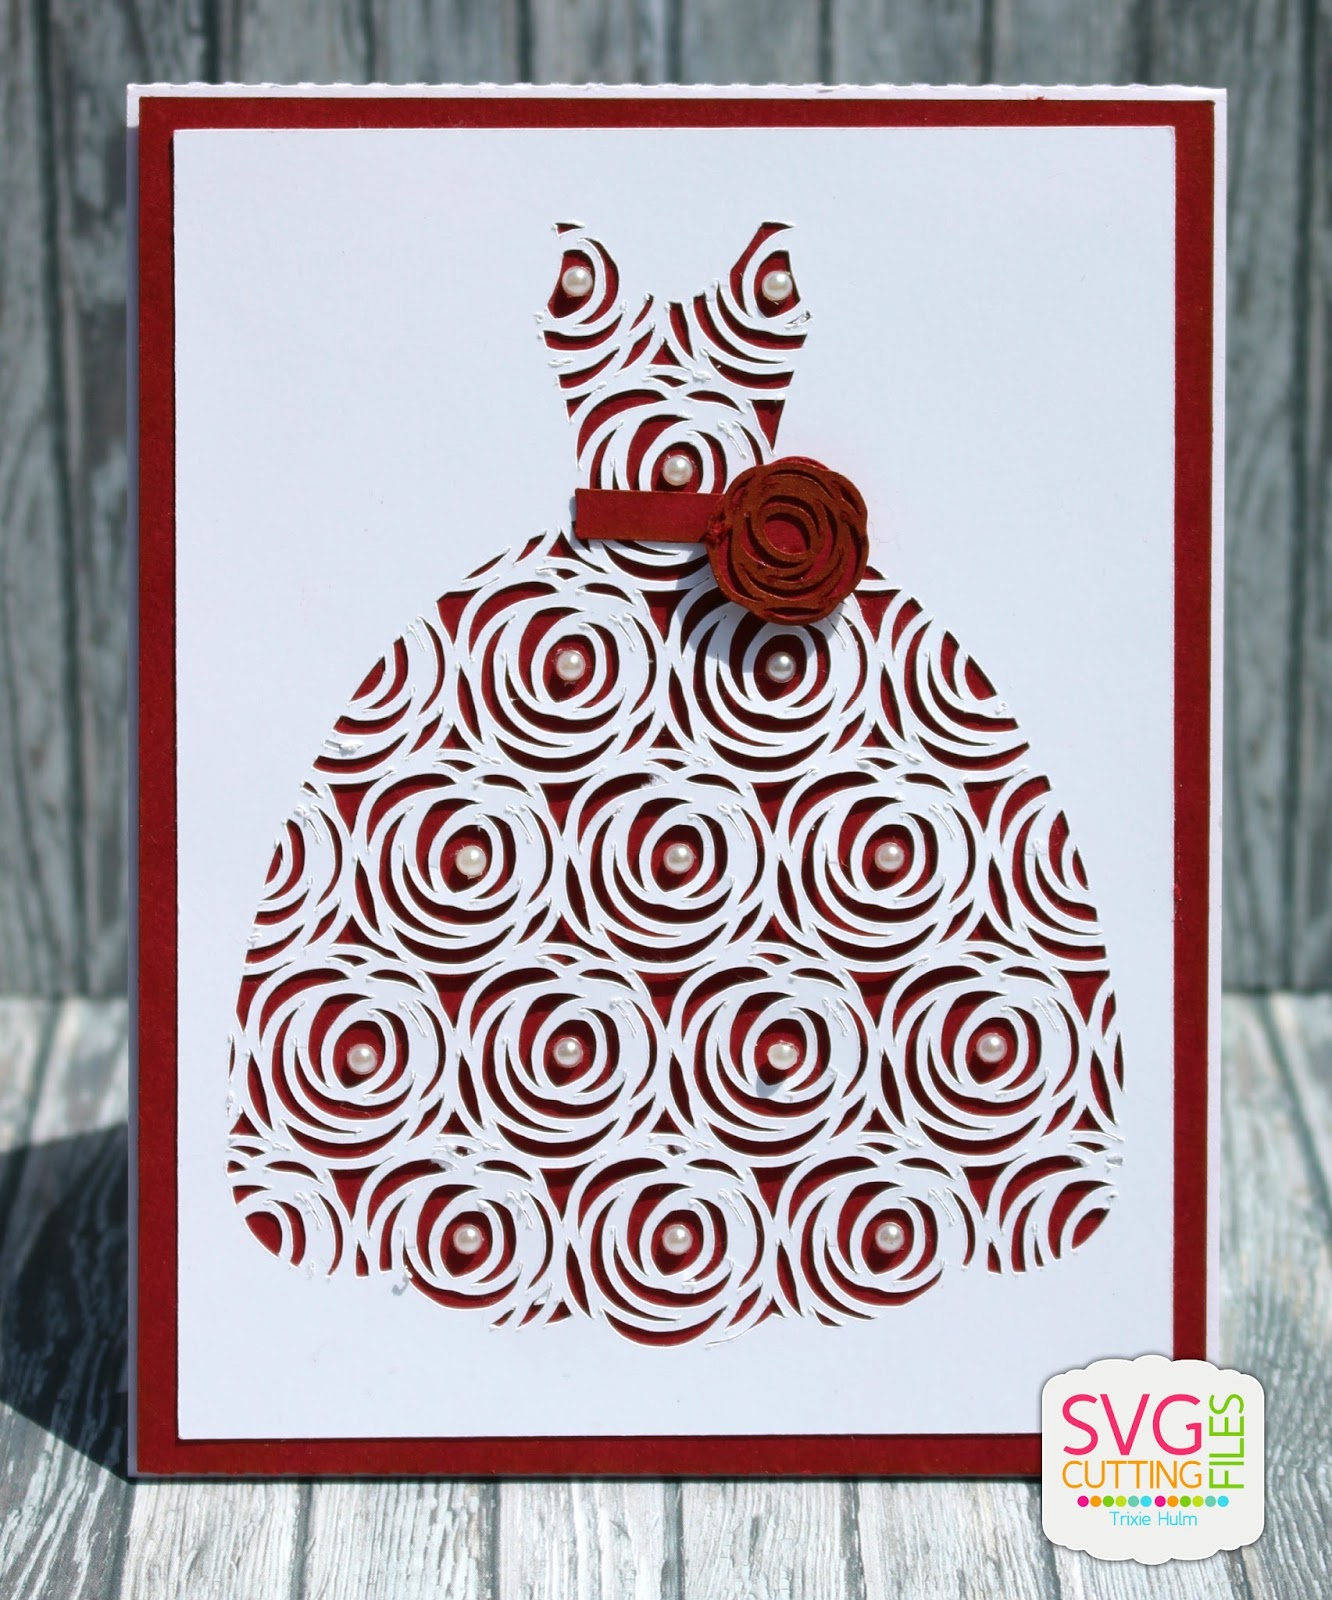 Download SVG Cutting Files: Wedding Card Kits